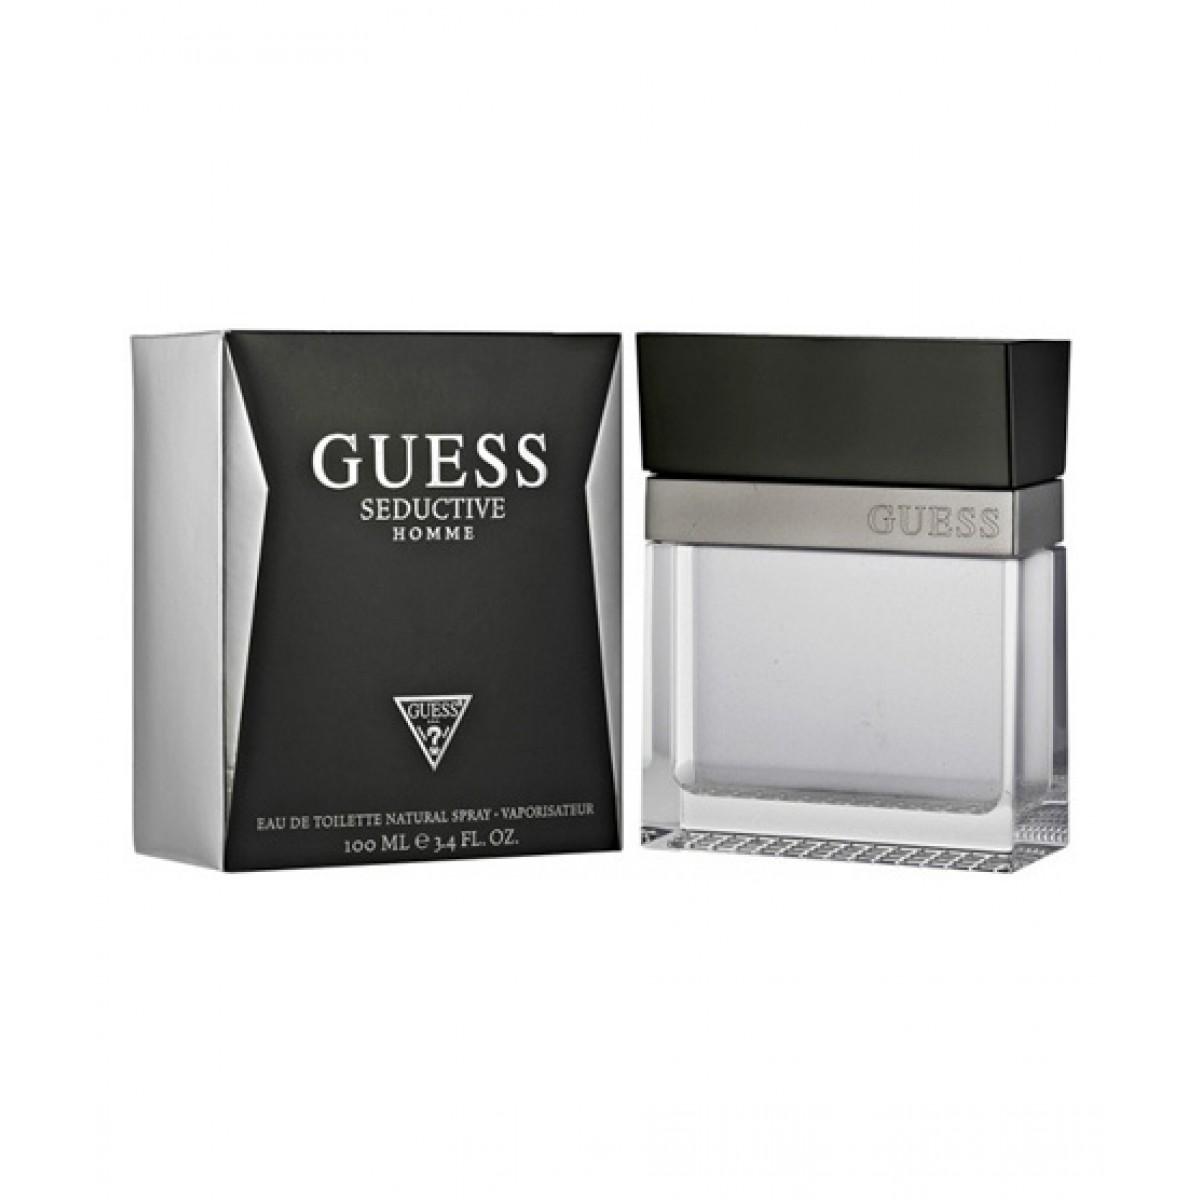 Perfume Men Edt For 100ml Seductive Guess Homme OkiPXZuT